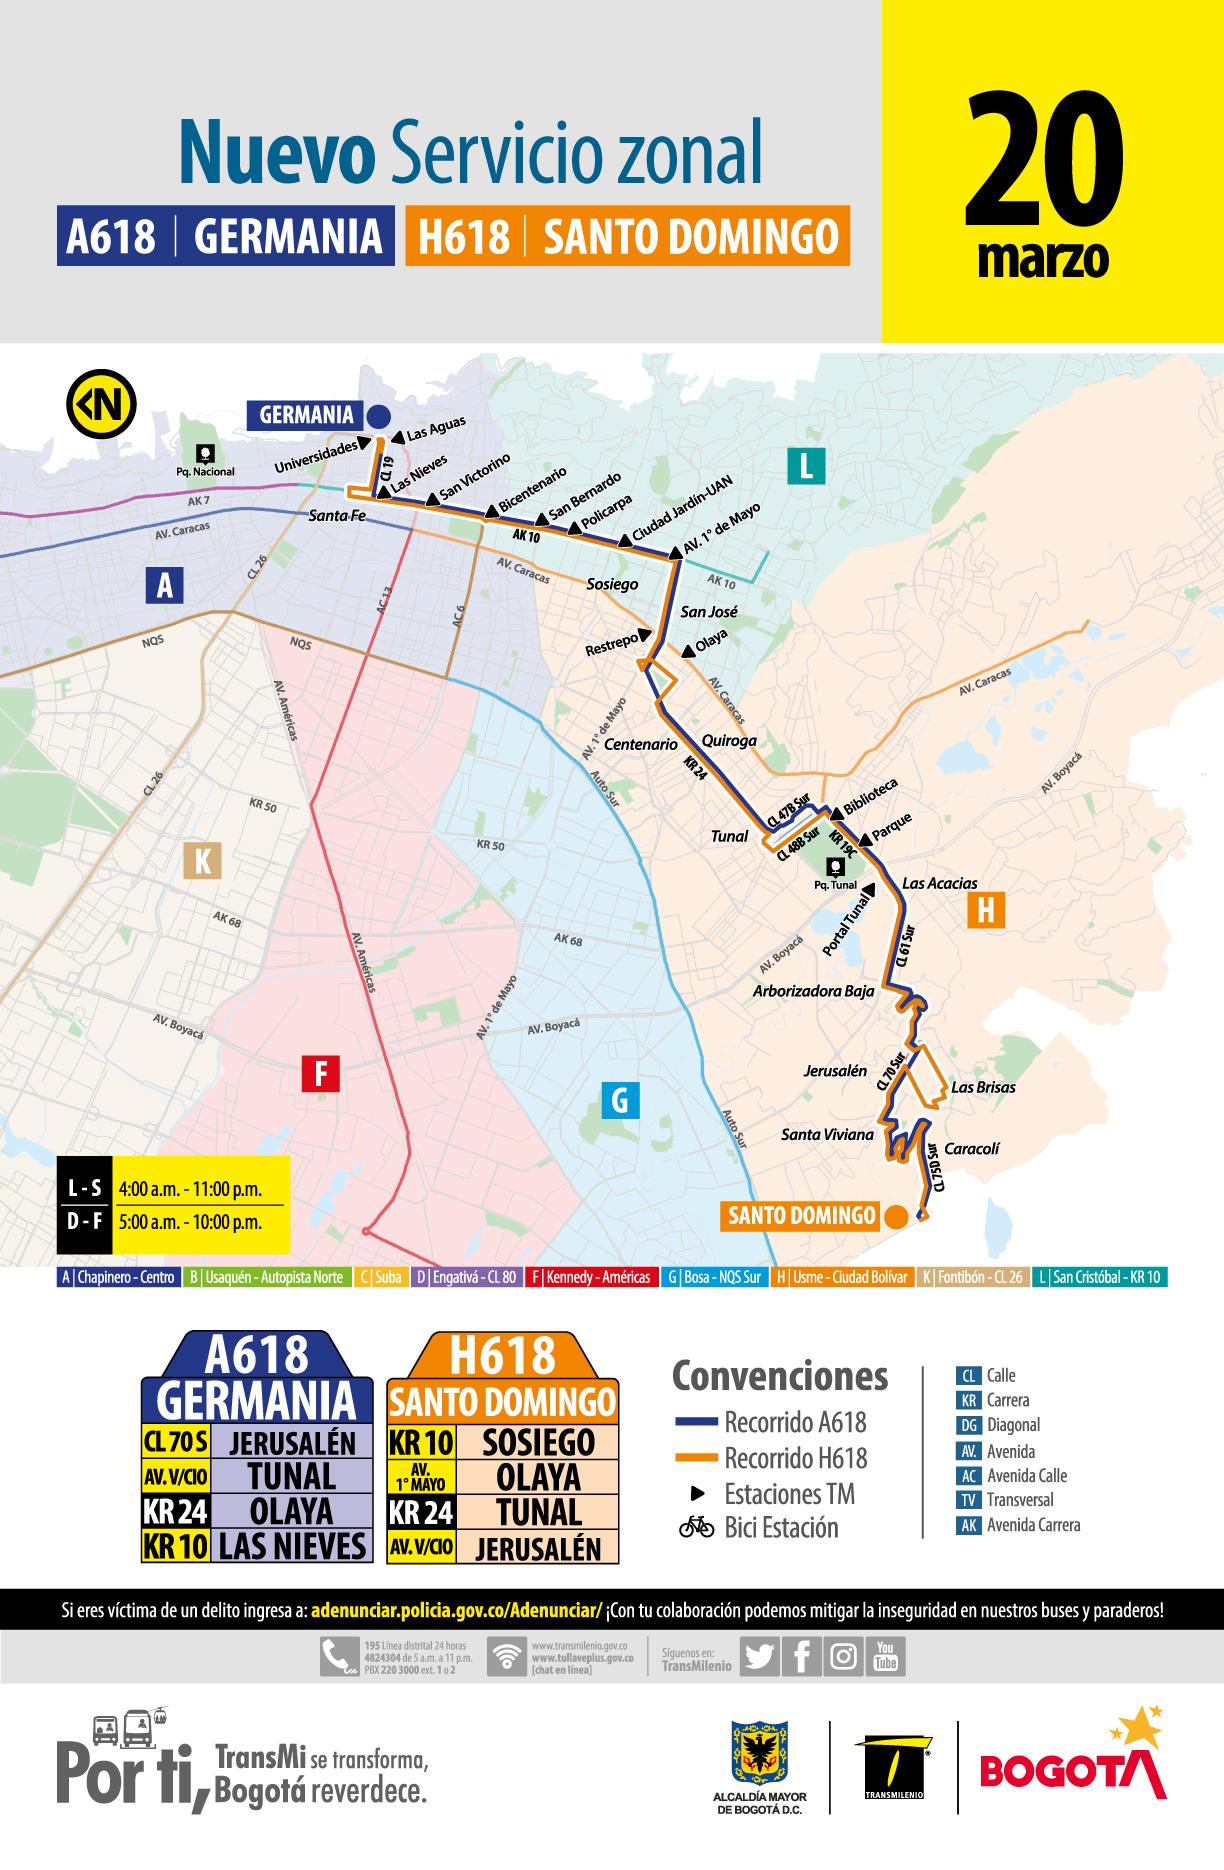 A618 Germania – H618 Santo Domingo